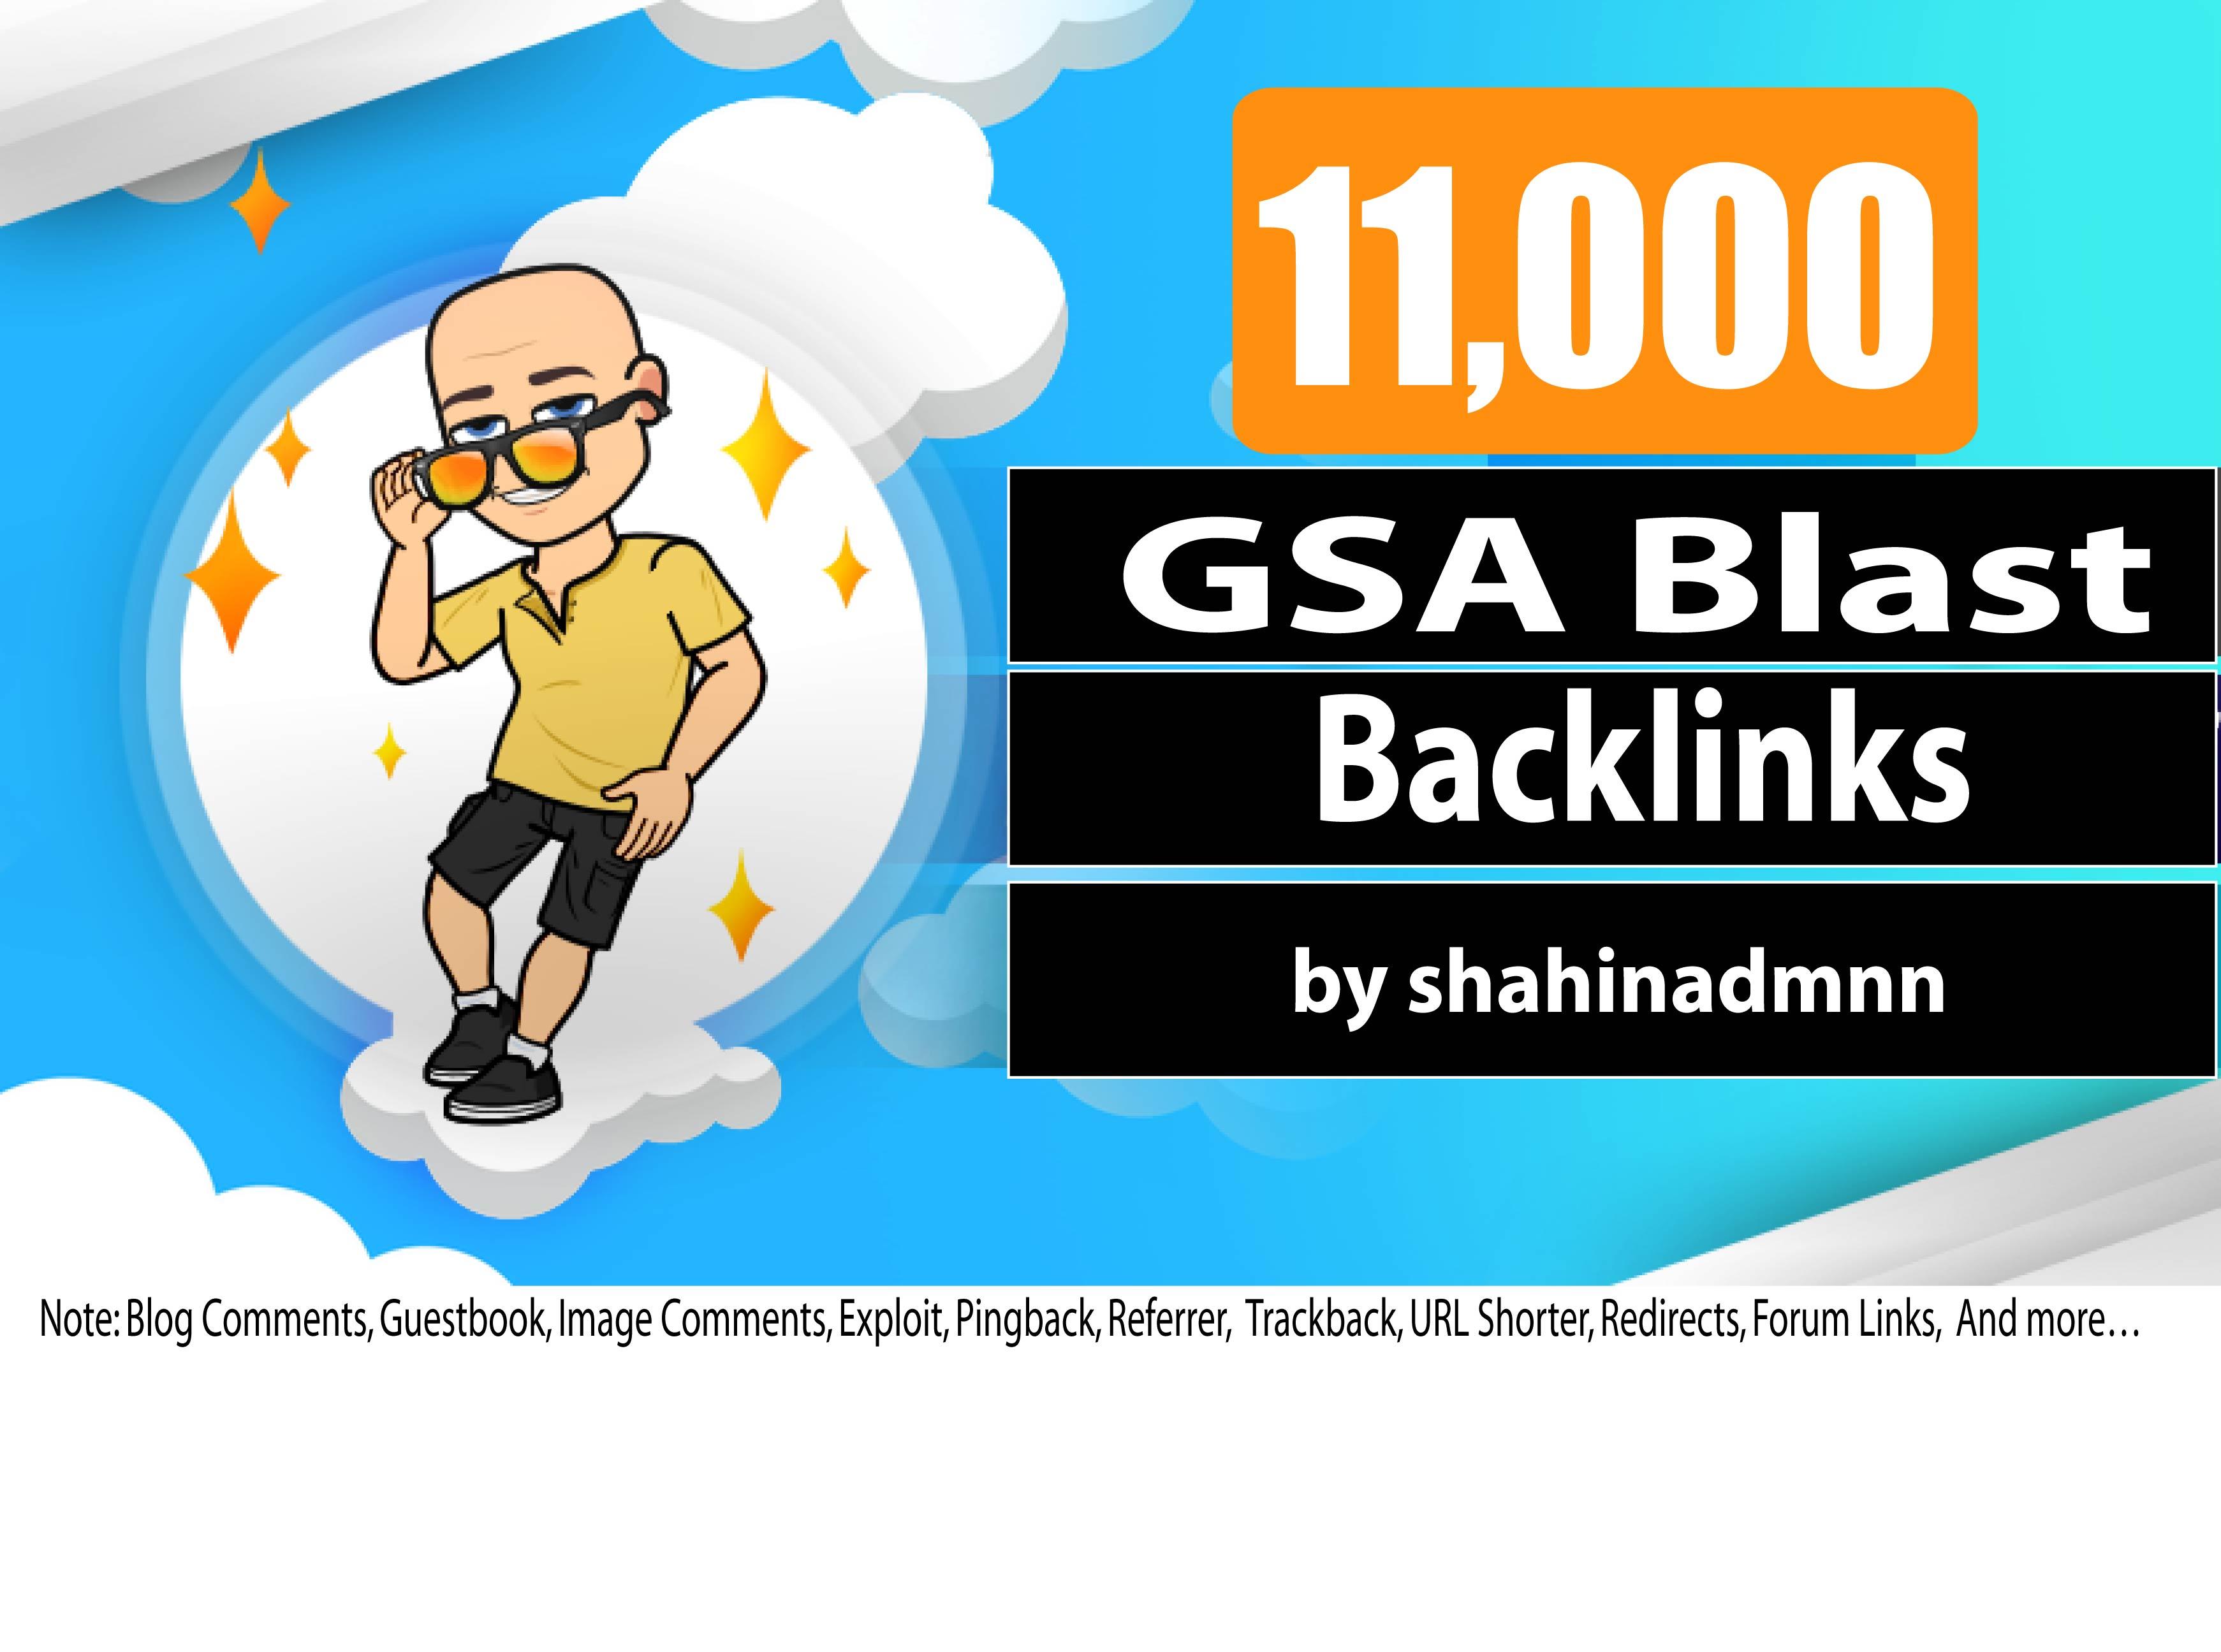 Create 11,000 GSA Backlinks & GSA Blast